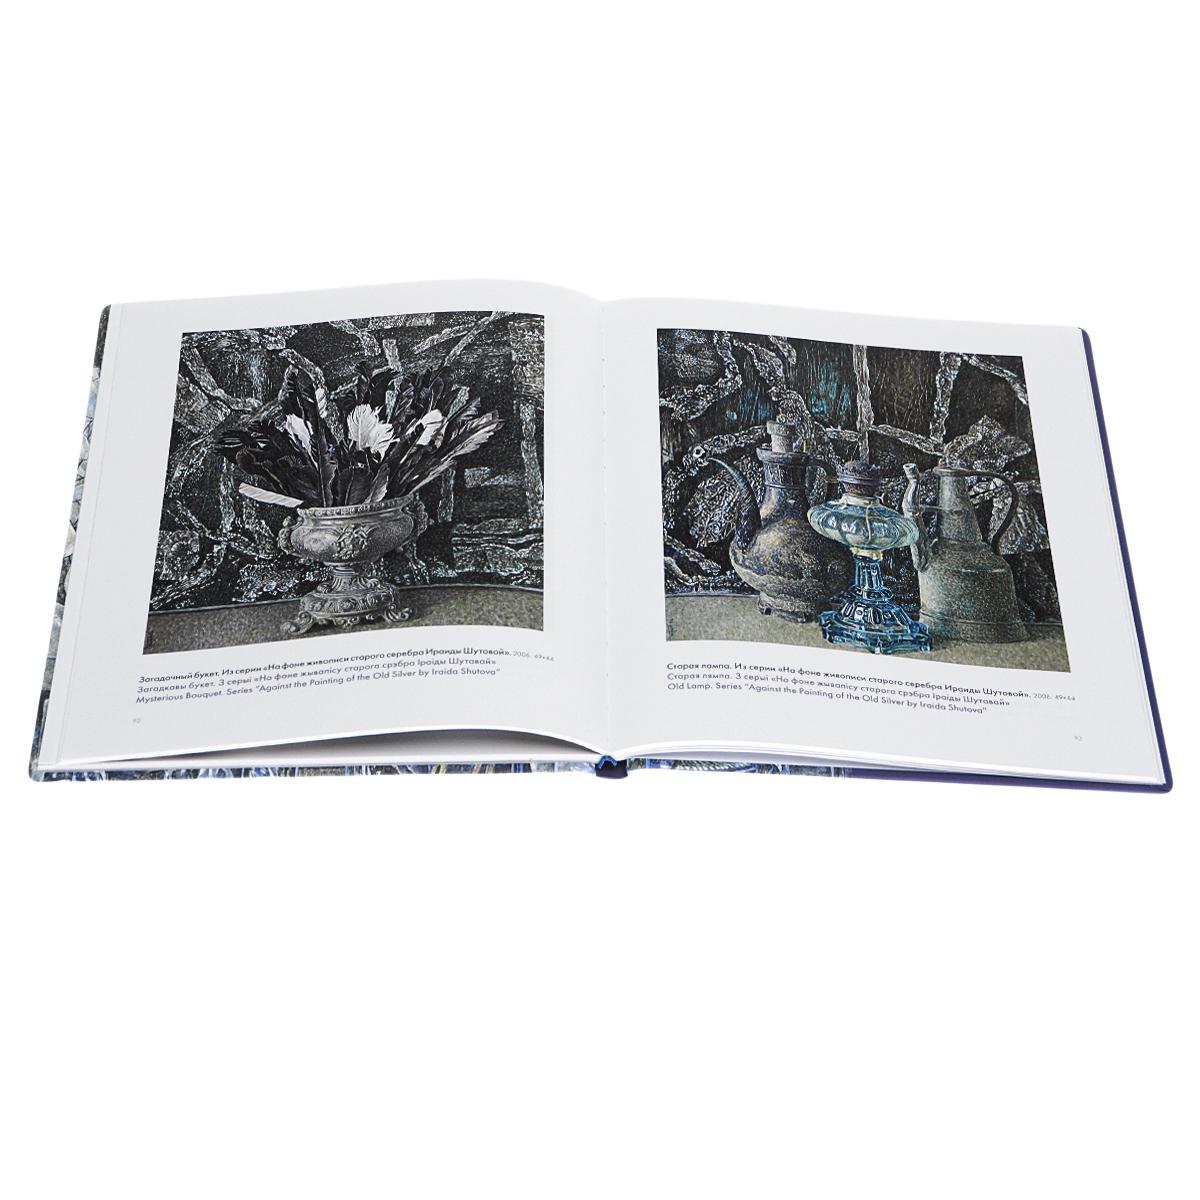 Геннадий Шутов. Акварели / Геннадзь Шутау. Акварэлi / Gennady Shutov: Watercolors